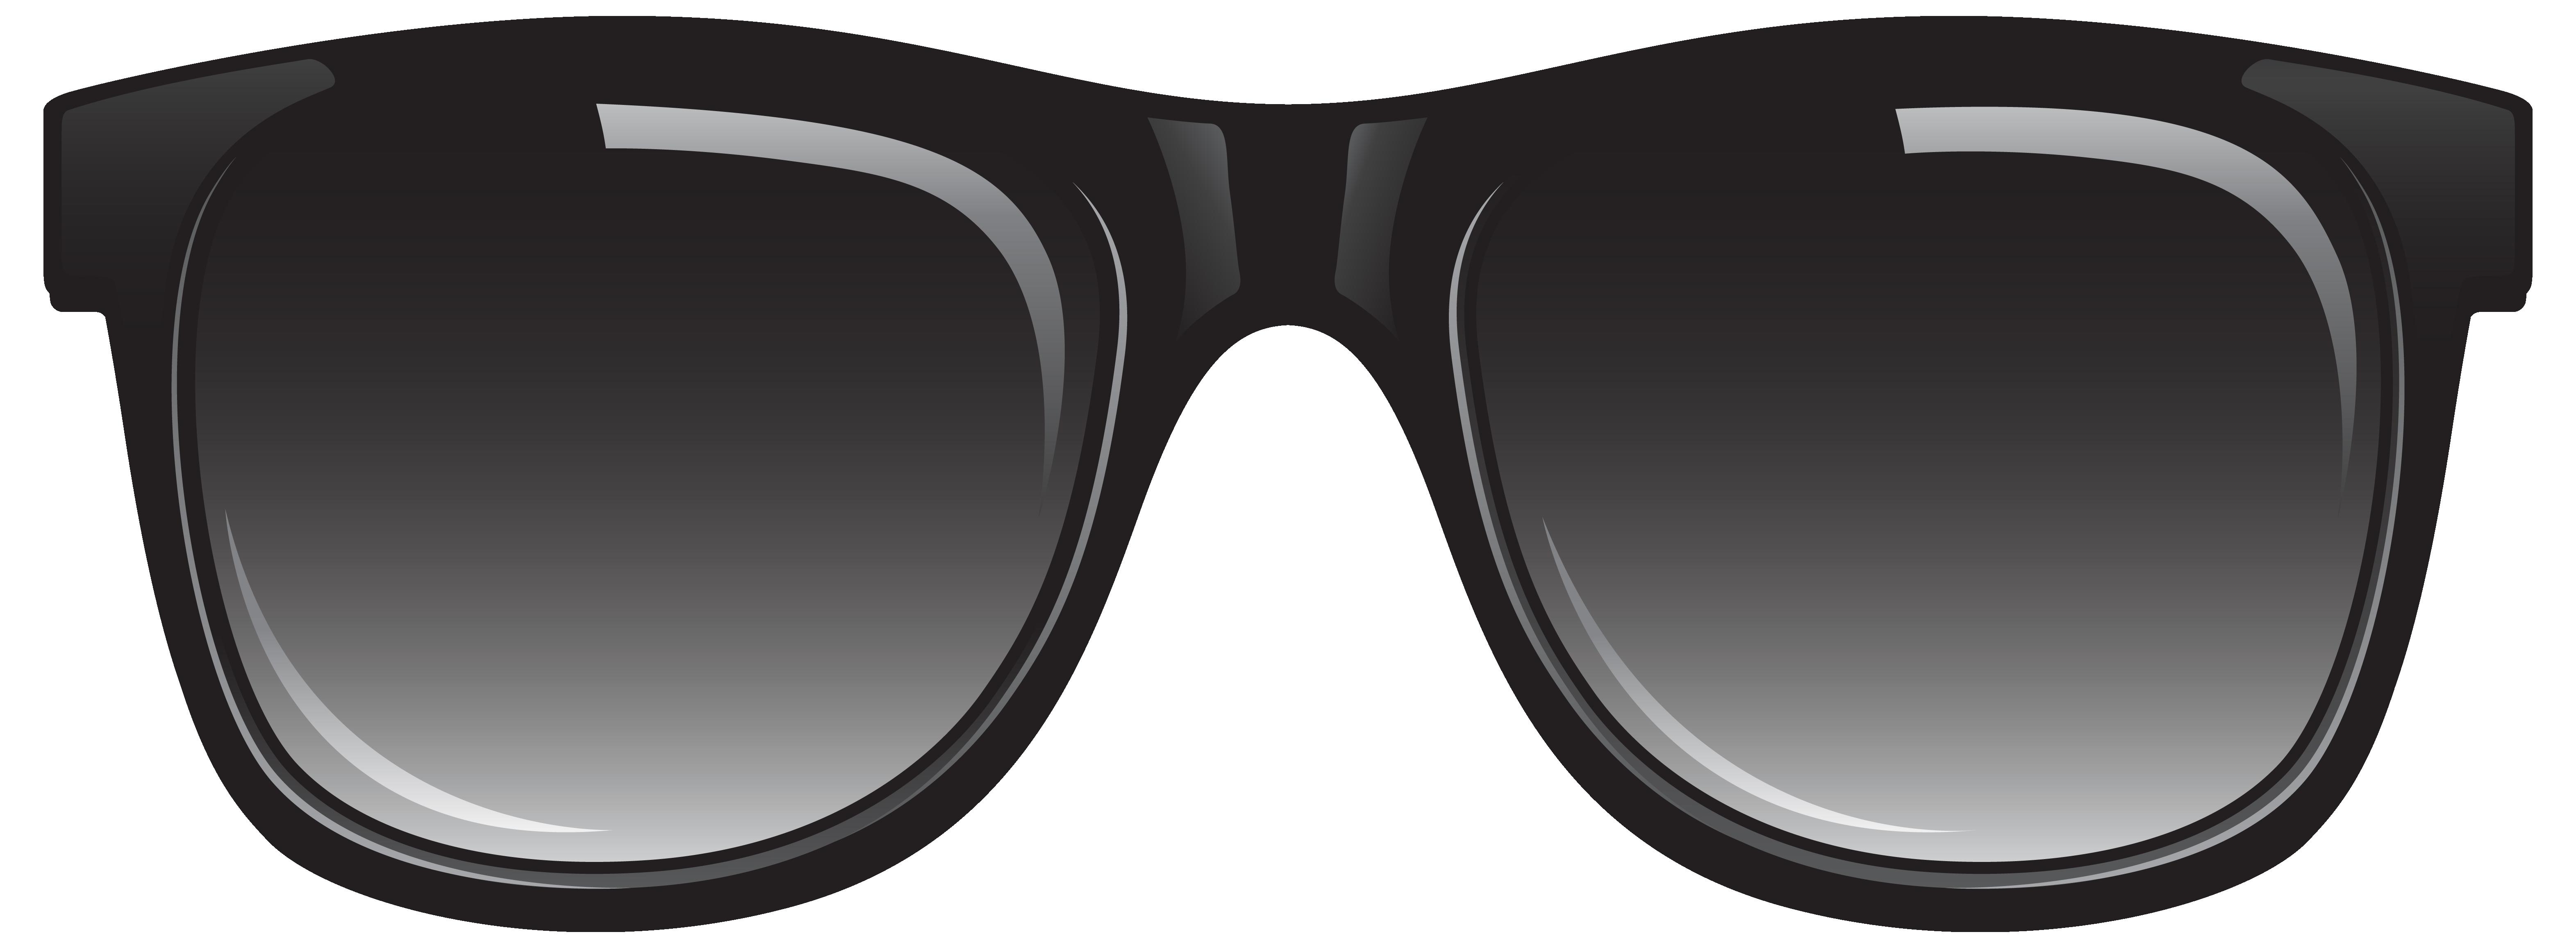 vector transparent stock Download sunglasses frames free. Clip glasses sun.